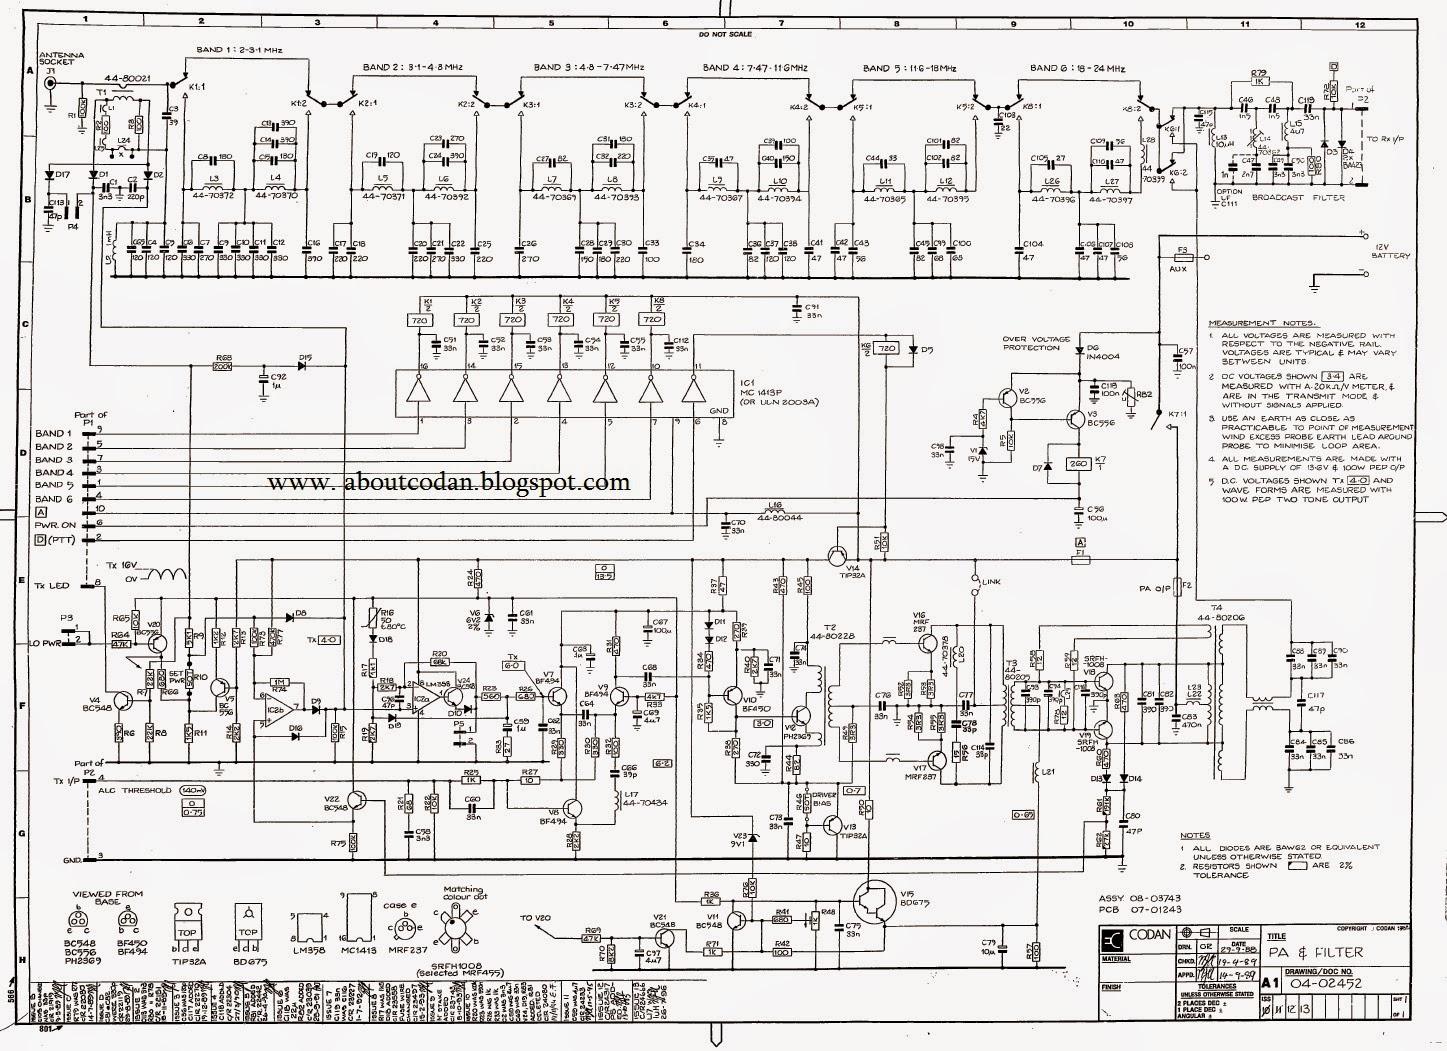 Everything about CODAN: CODAN 9480 Power Amplifier & Filter ...